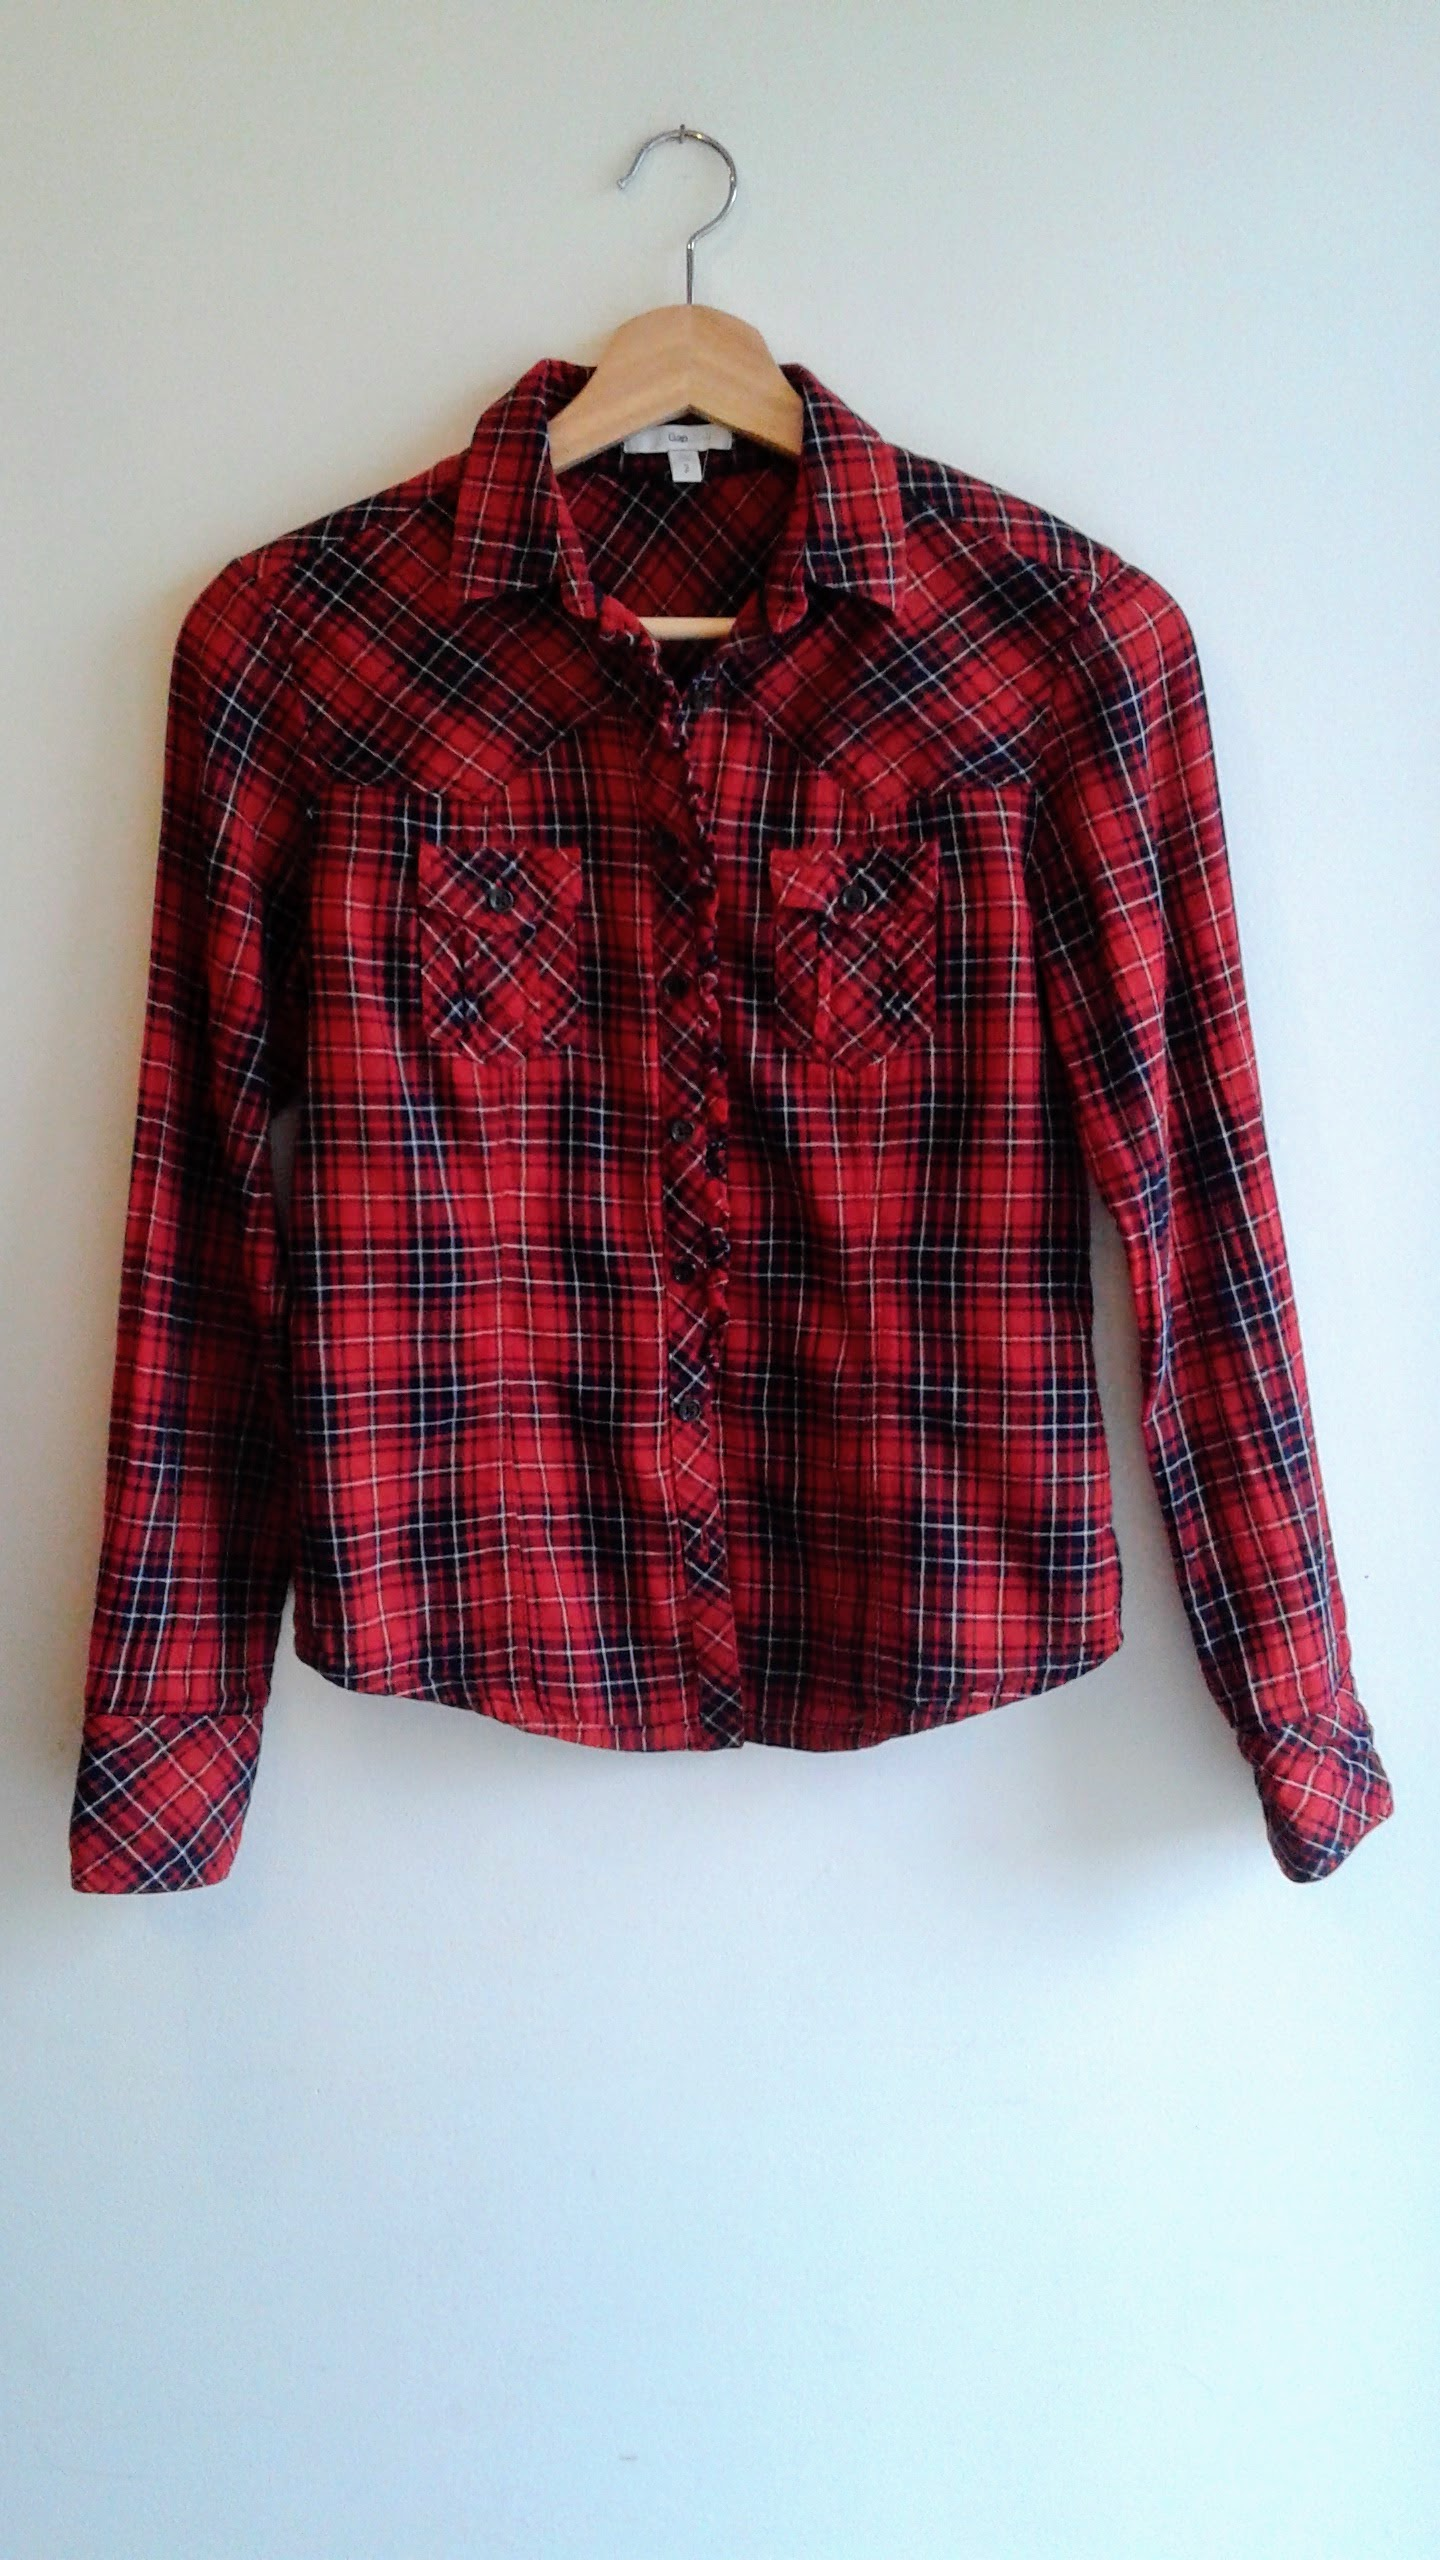 Gap shirt; Size S, $16